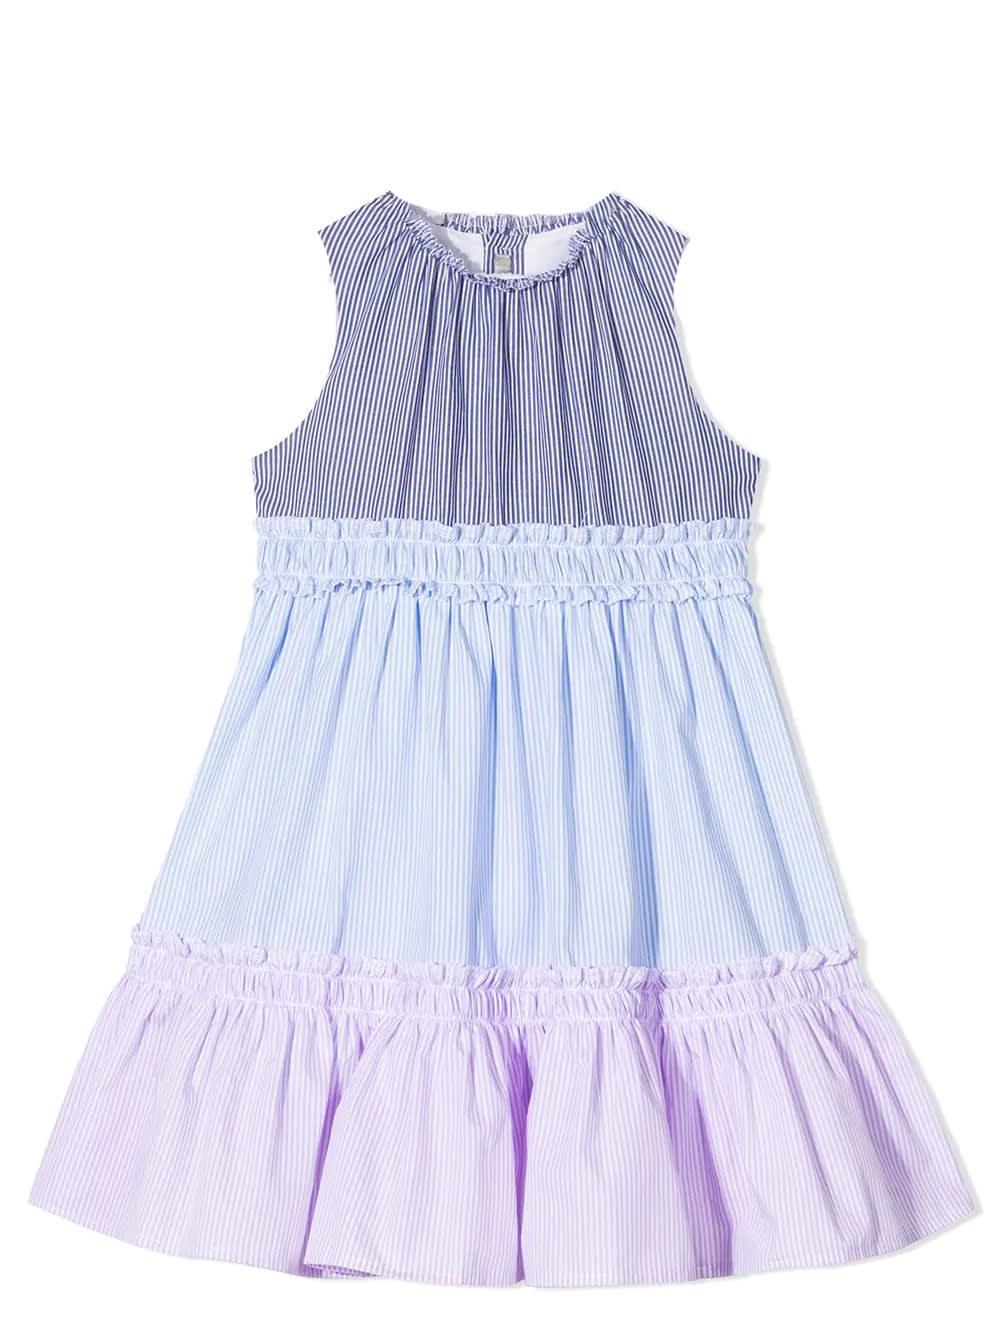 Il Gufo Cottons STRIPED DRESS